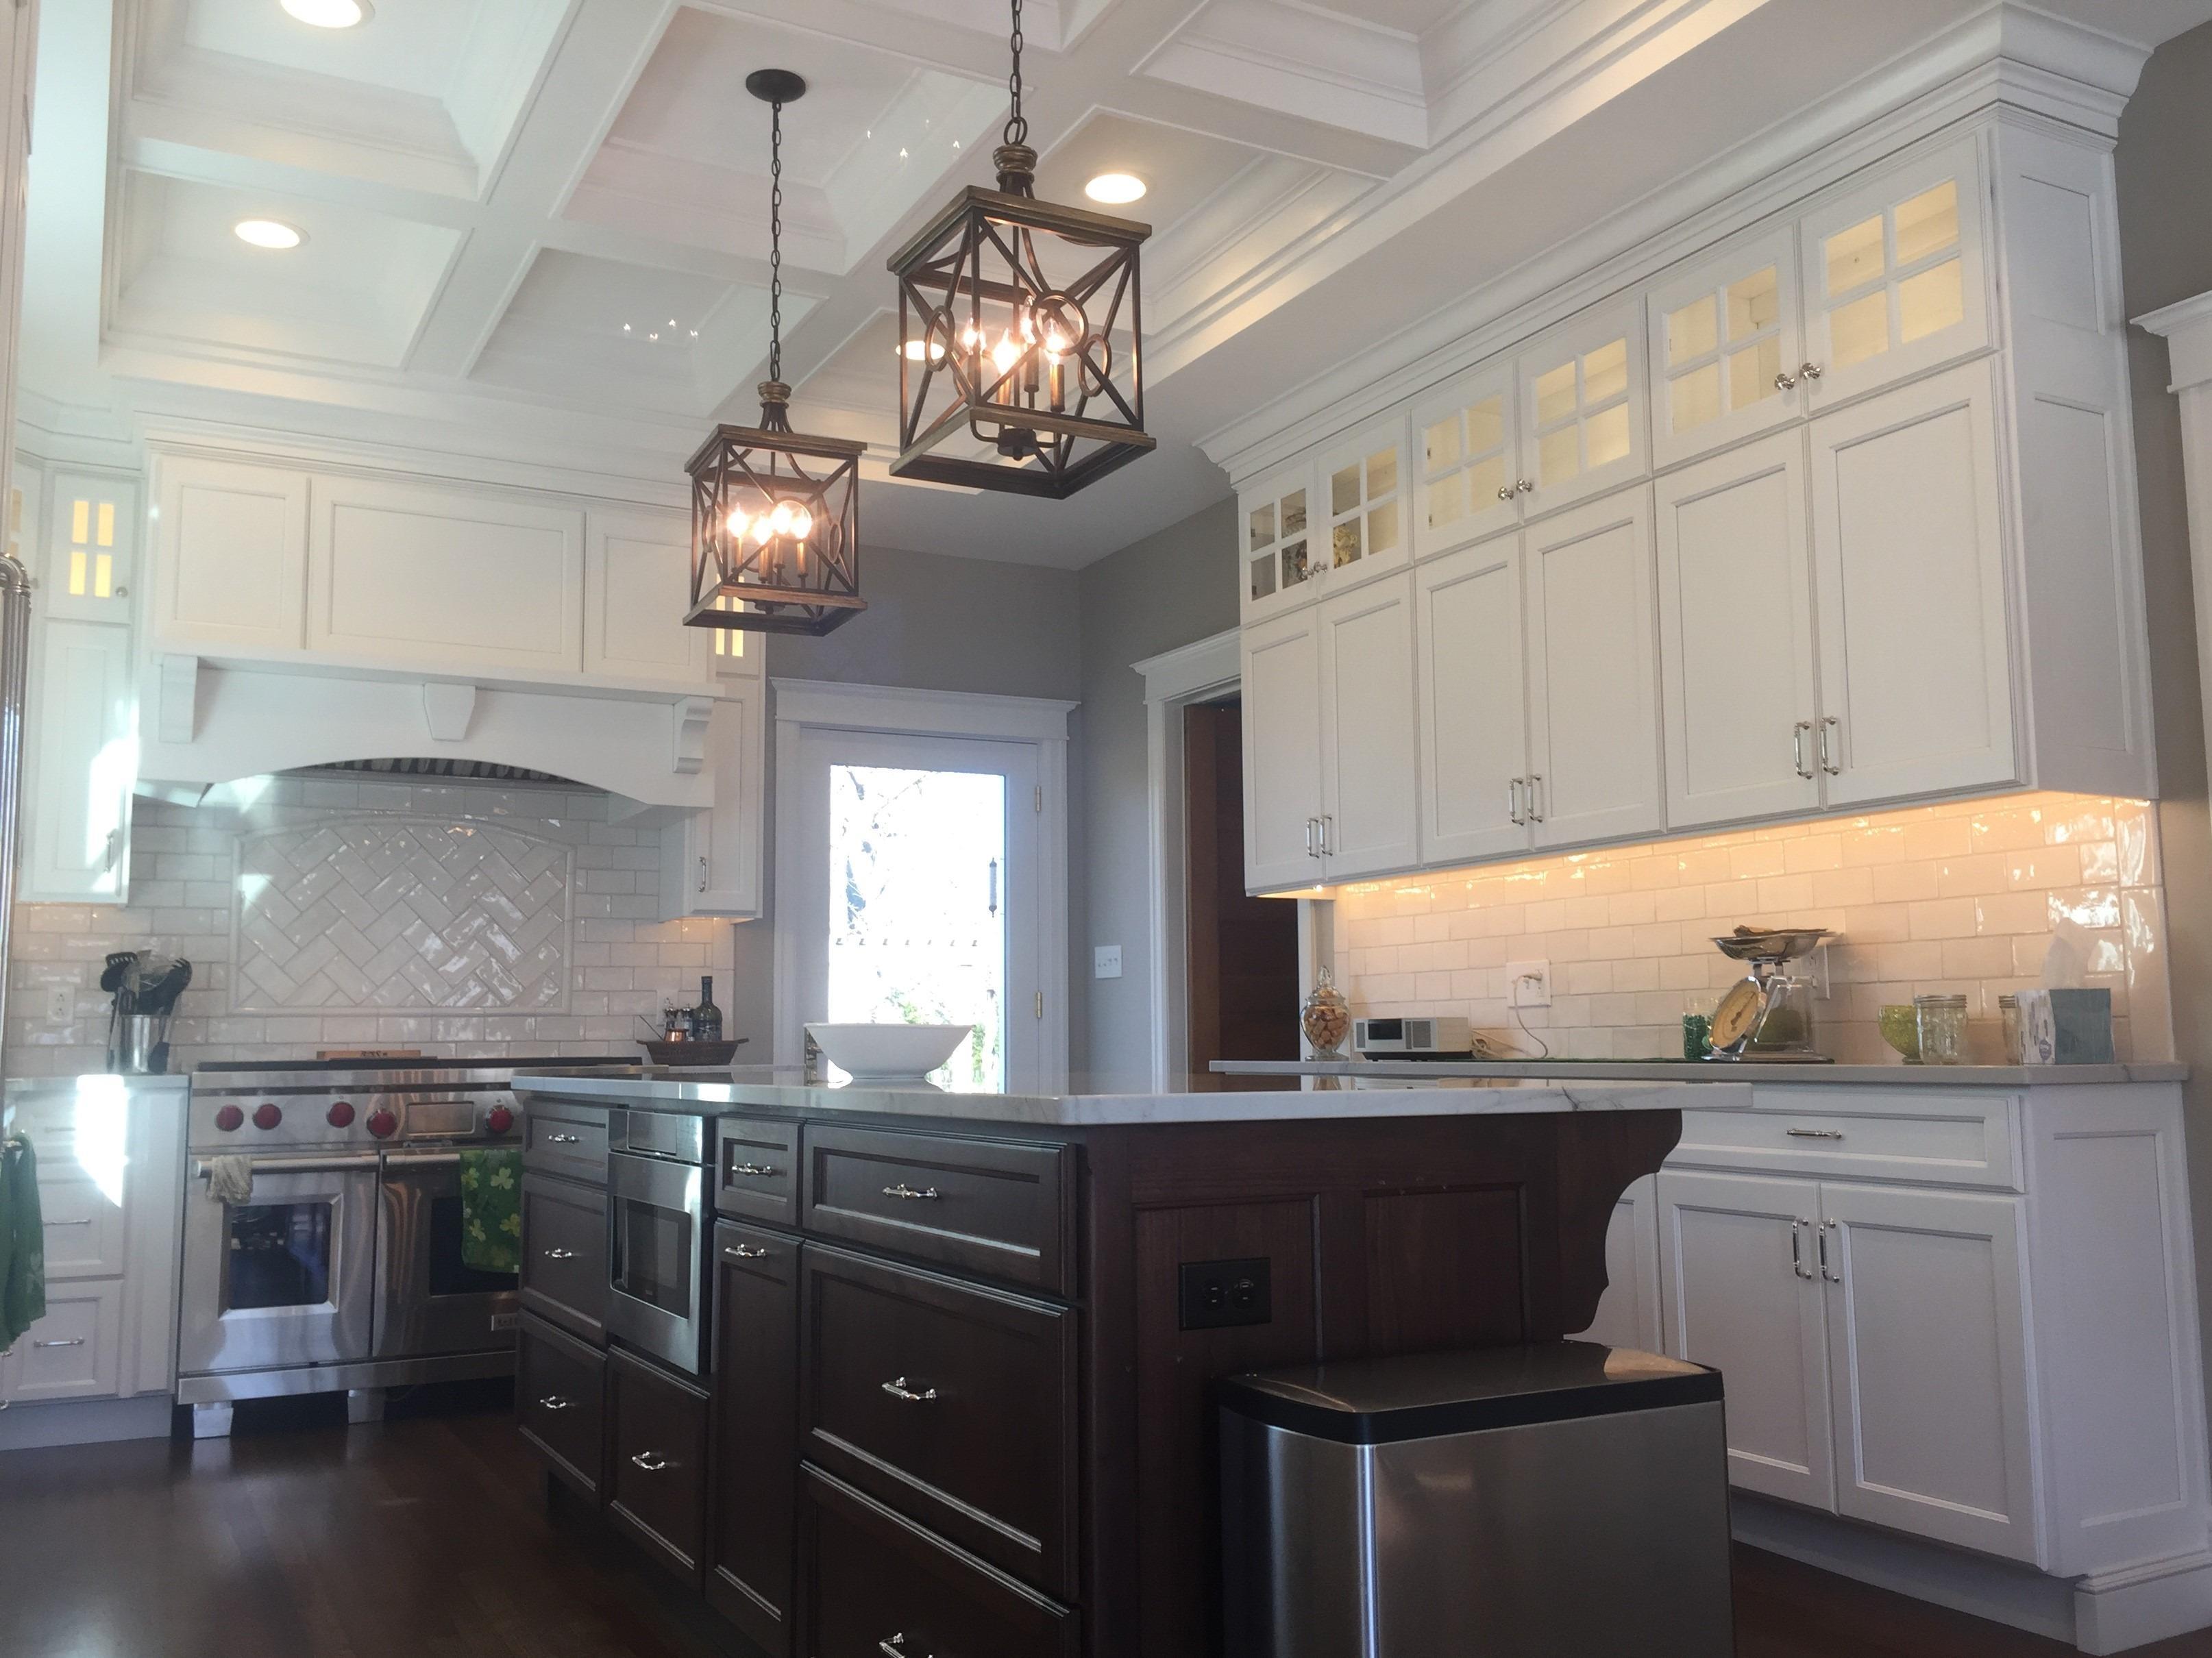 Callier & Thompson Kitchen Bath Appliance image 7